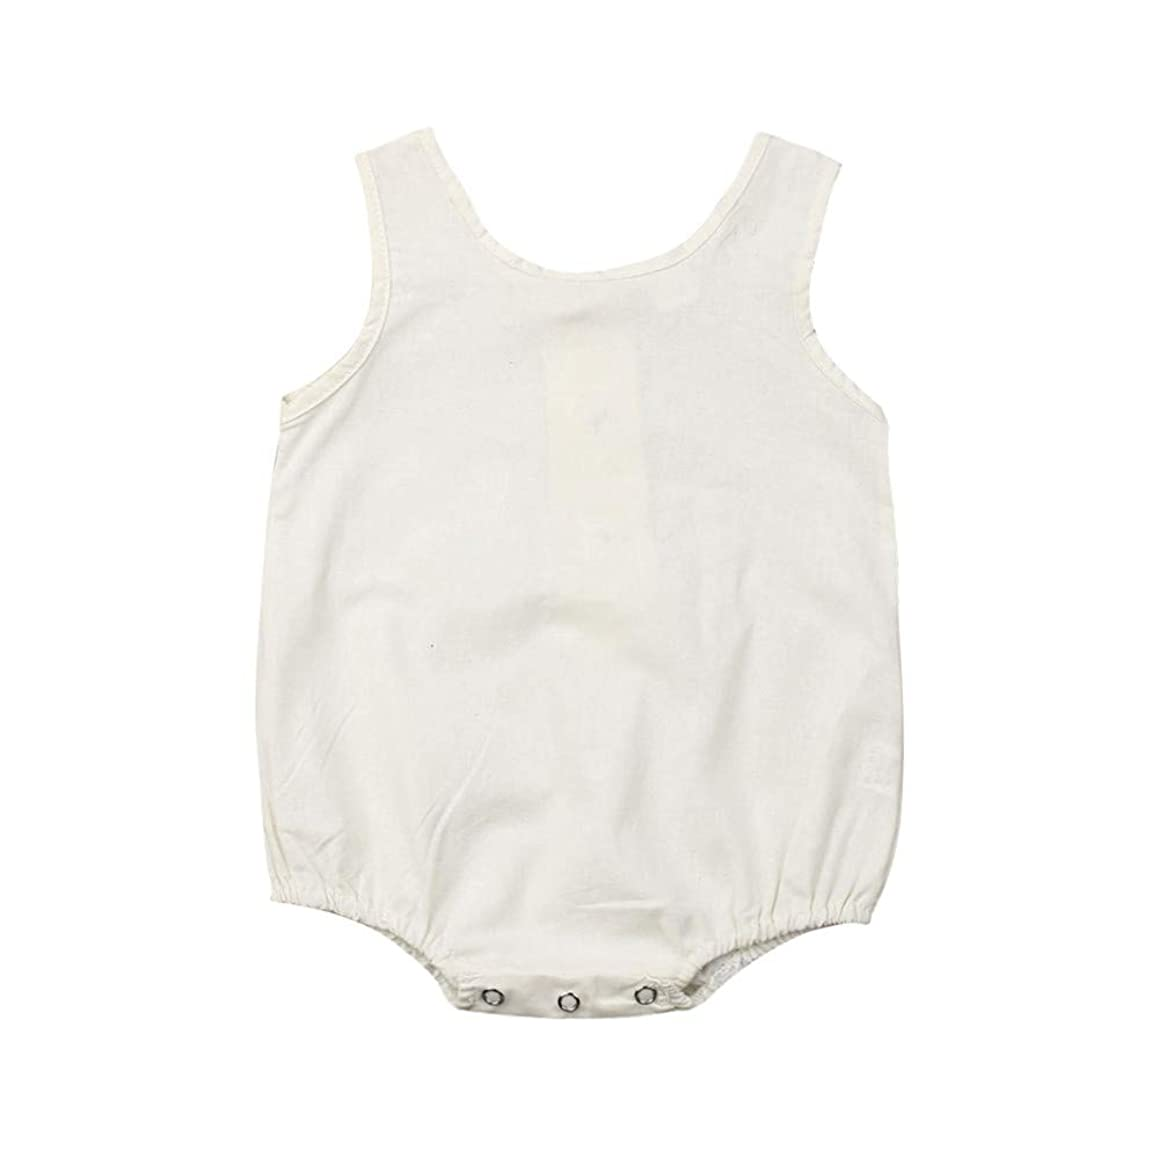 Newborn Baby Boy Girl Linen Sleeveless Romper Jumpsuit Infant Summer Stripes Bodysuit Outfits